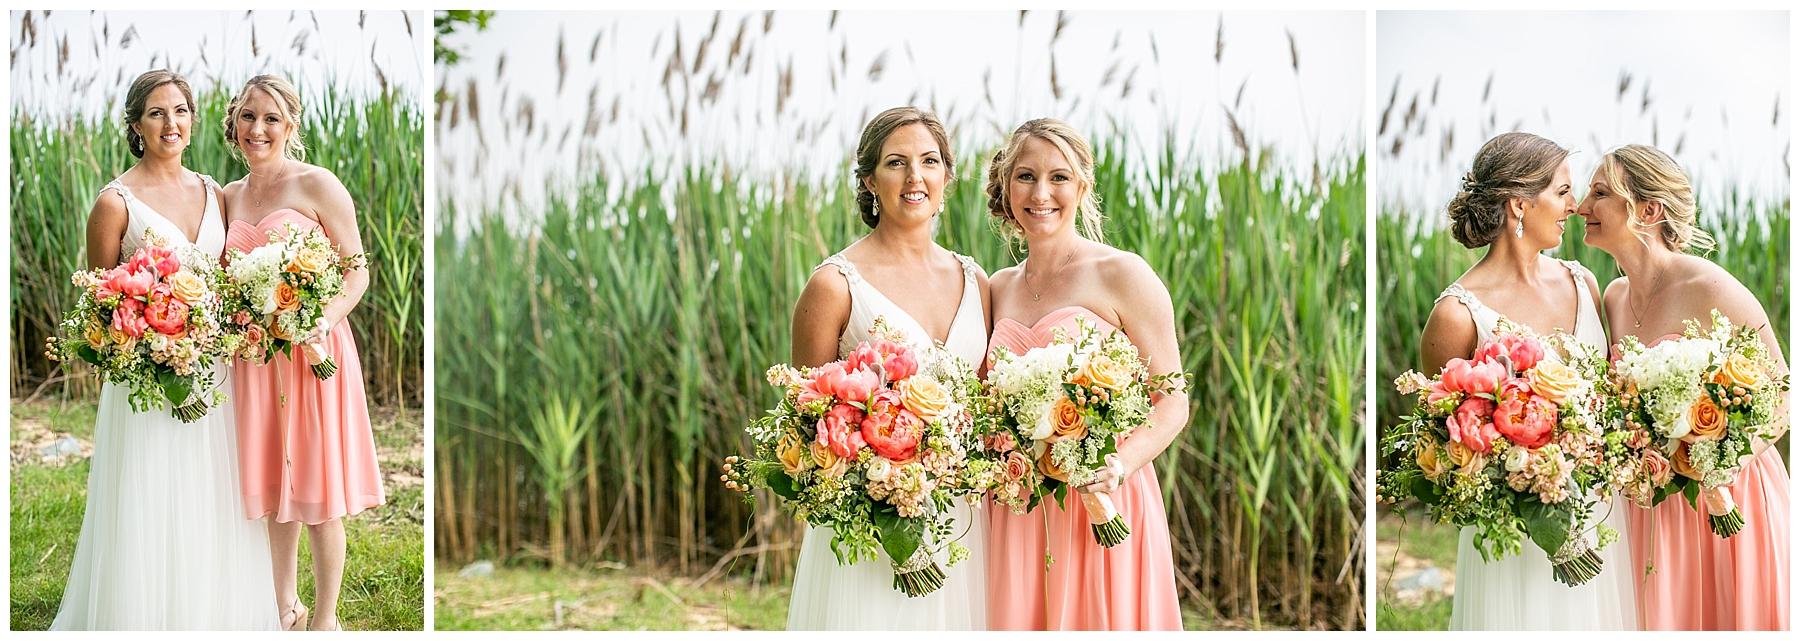 Chelsea Phil Bohemia River Overlook Wedding Living Radiant Photography photos_0064.jpg